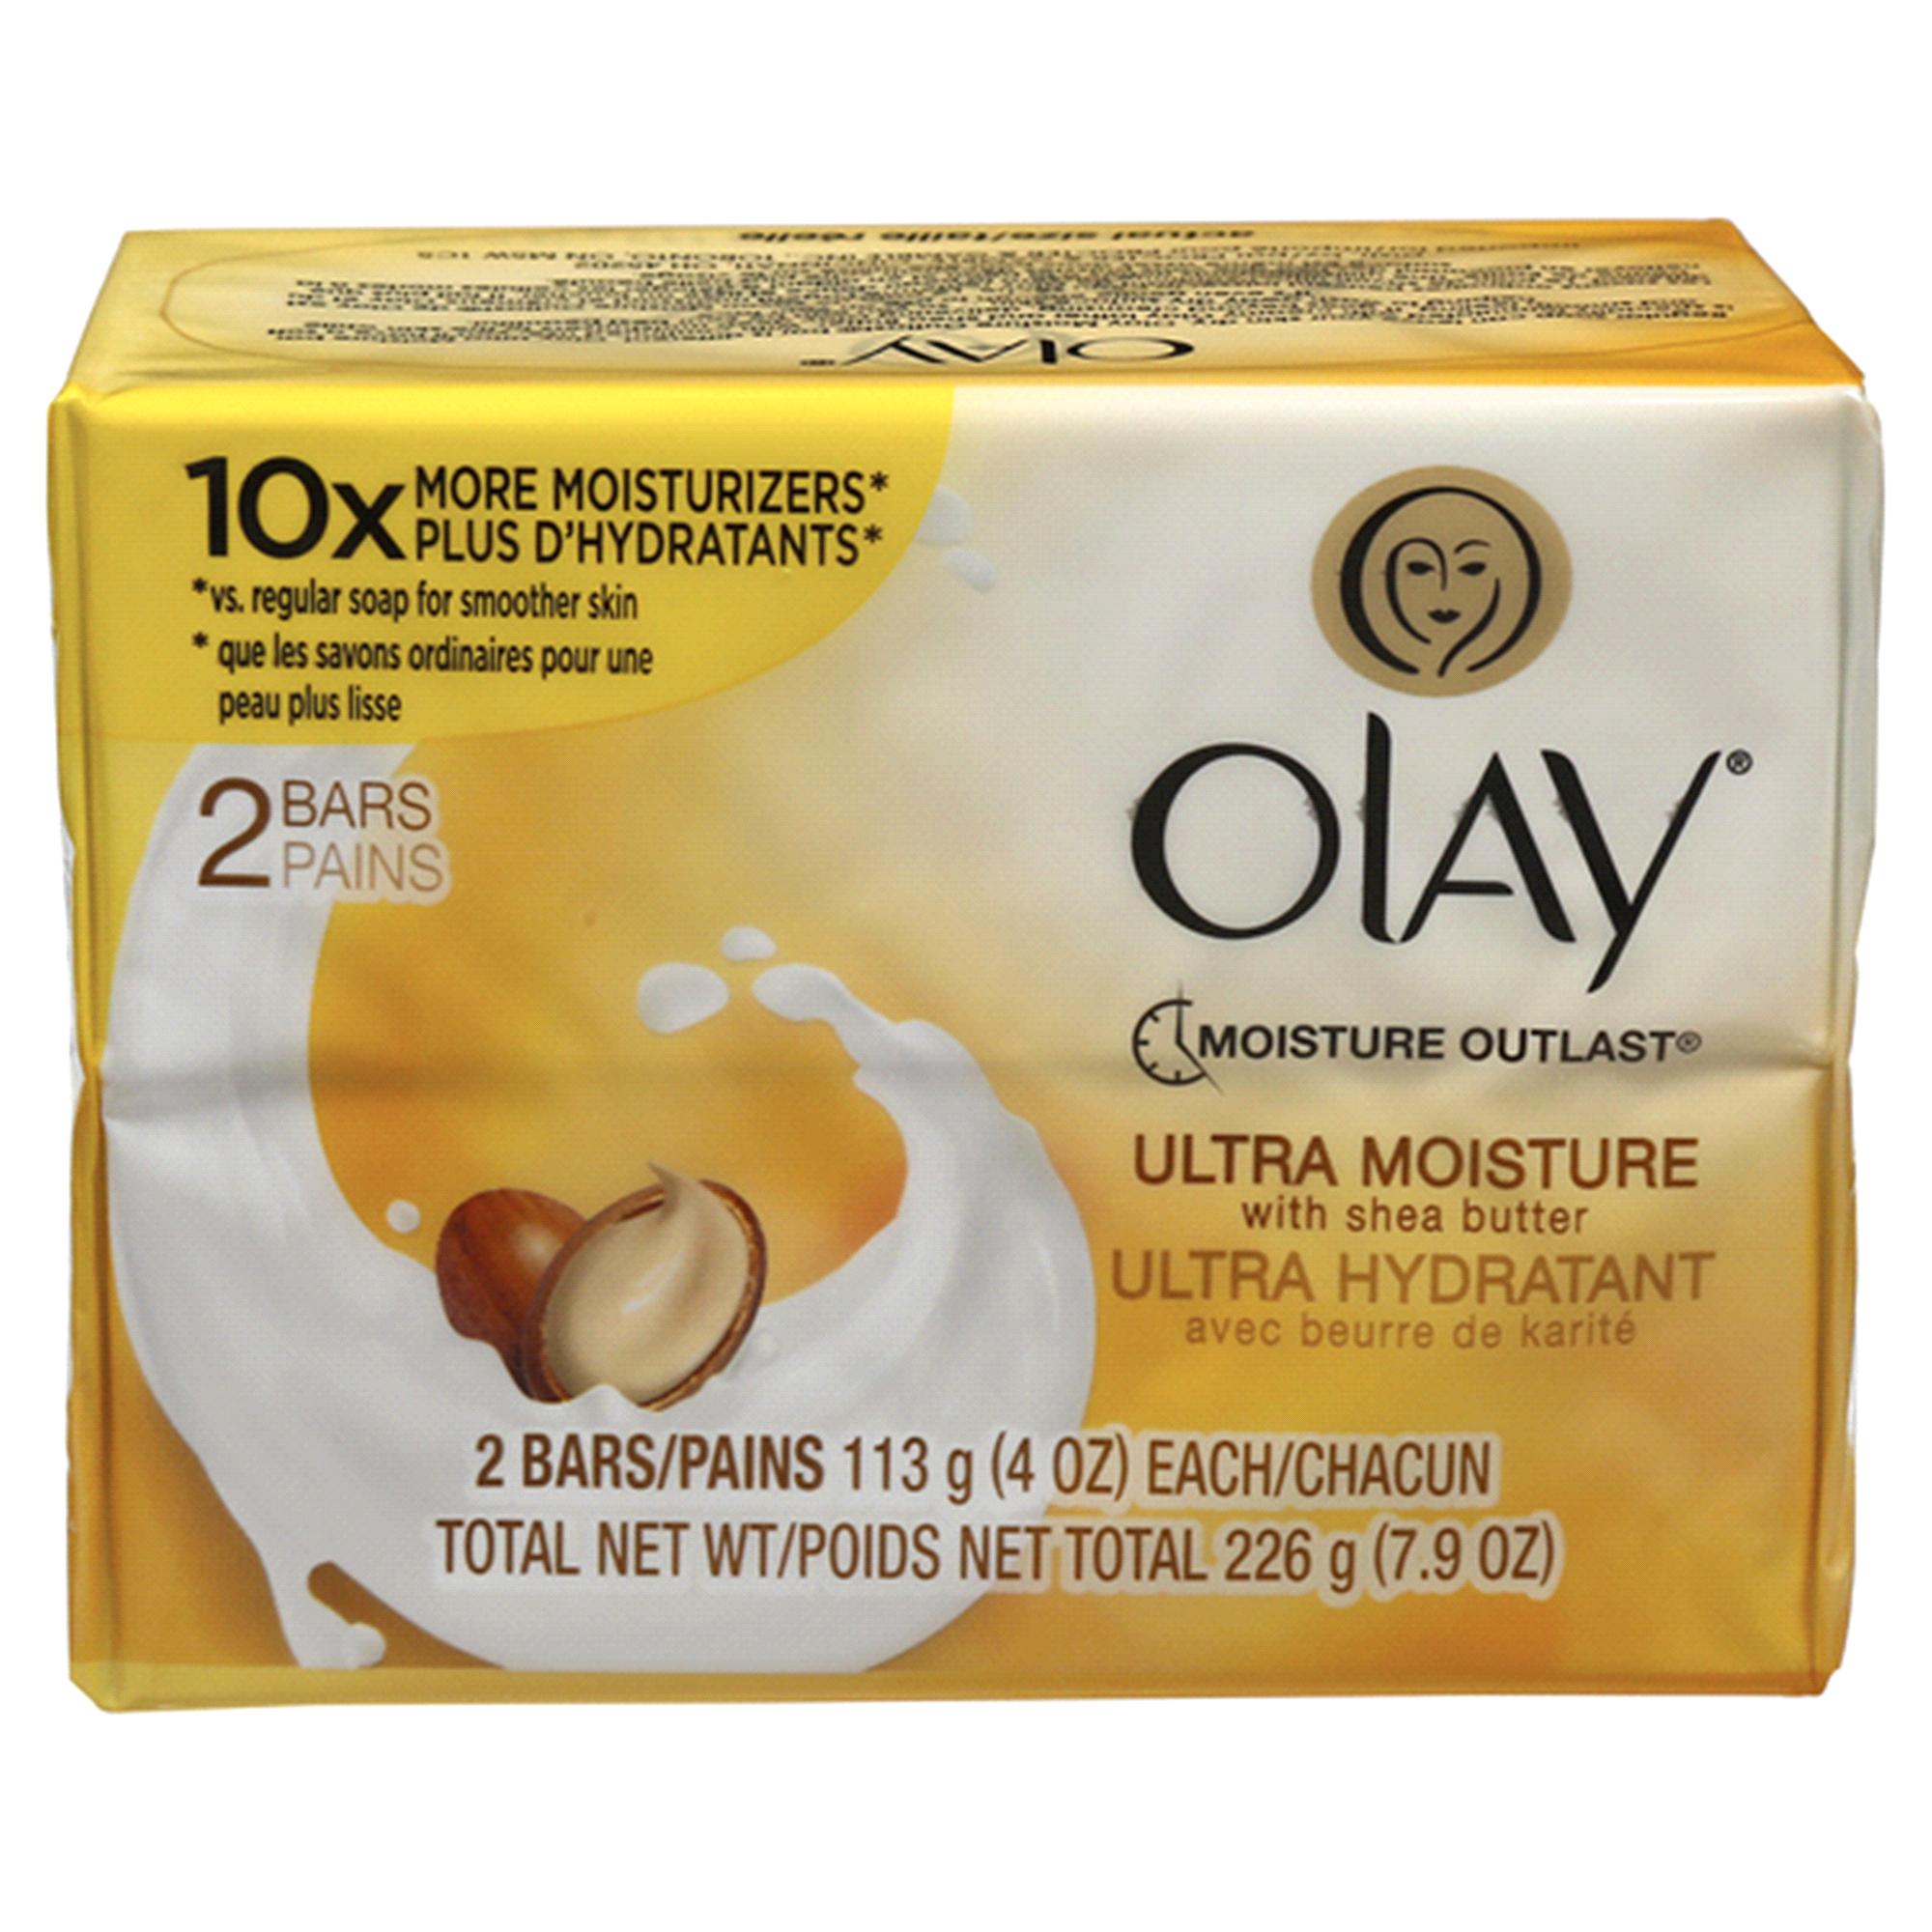 Olay Ultra Moisture Beauty Bar Soap with Shea Butter 4 oz 2 Bars |  Meijer.com